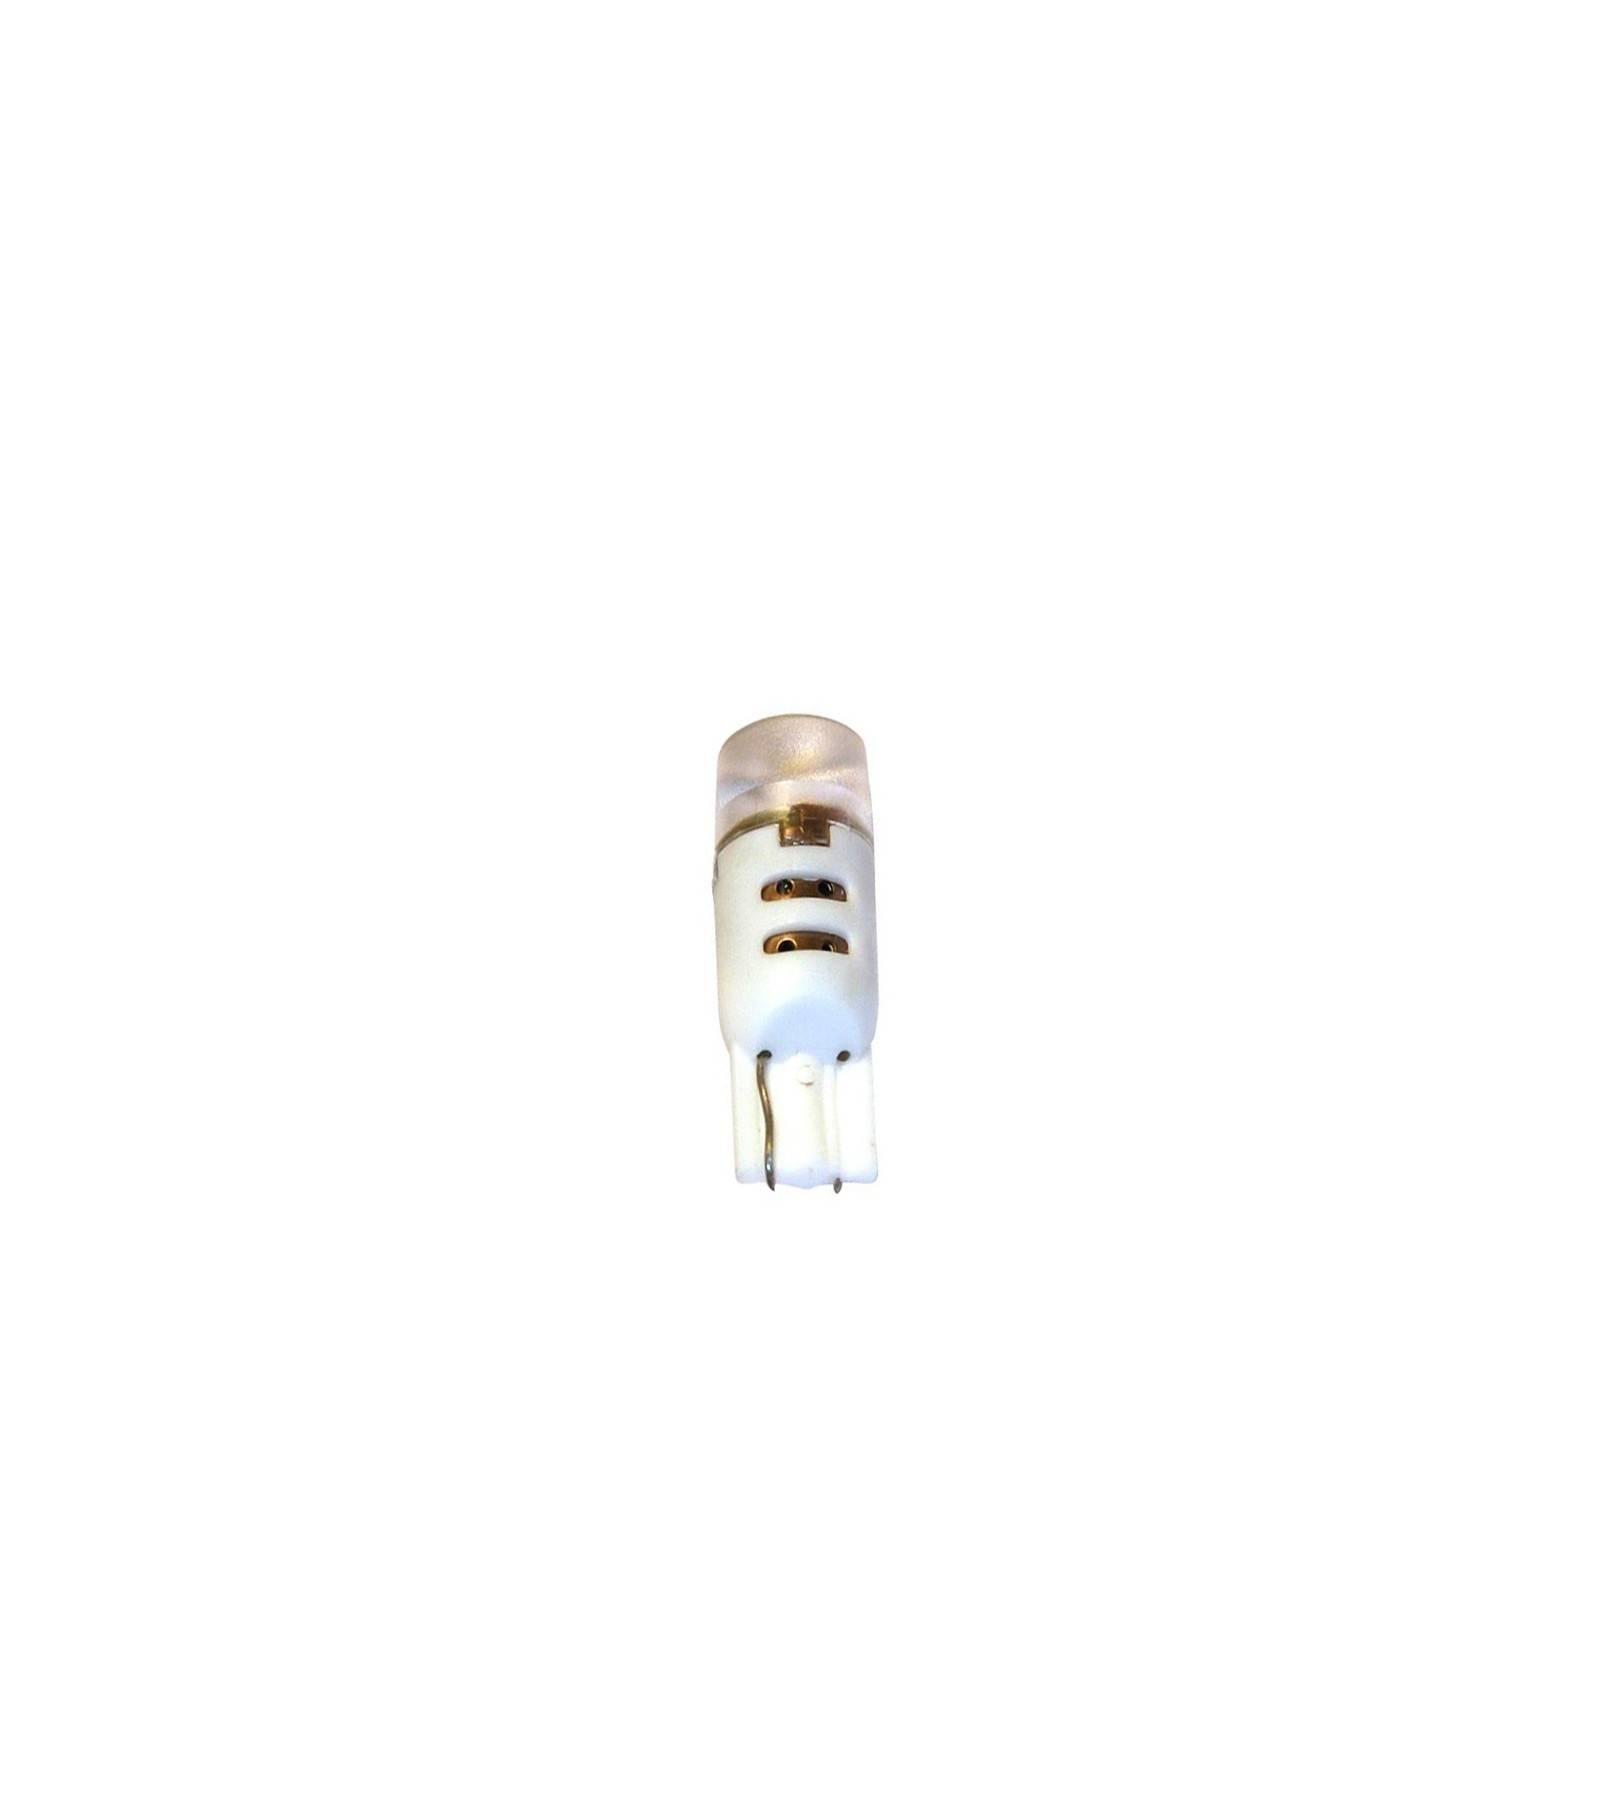 Mr16 G4 5w Chaud 1 Ampoule Garden 90lm 12v Lights Gl6208451 120° Led Blanc fYbyv76g